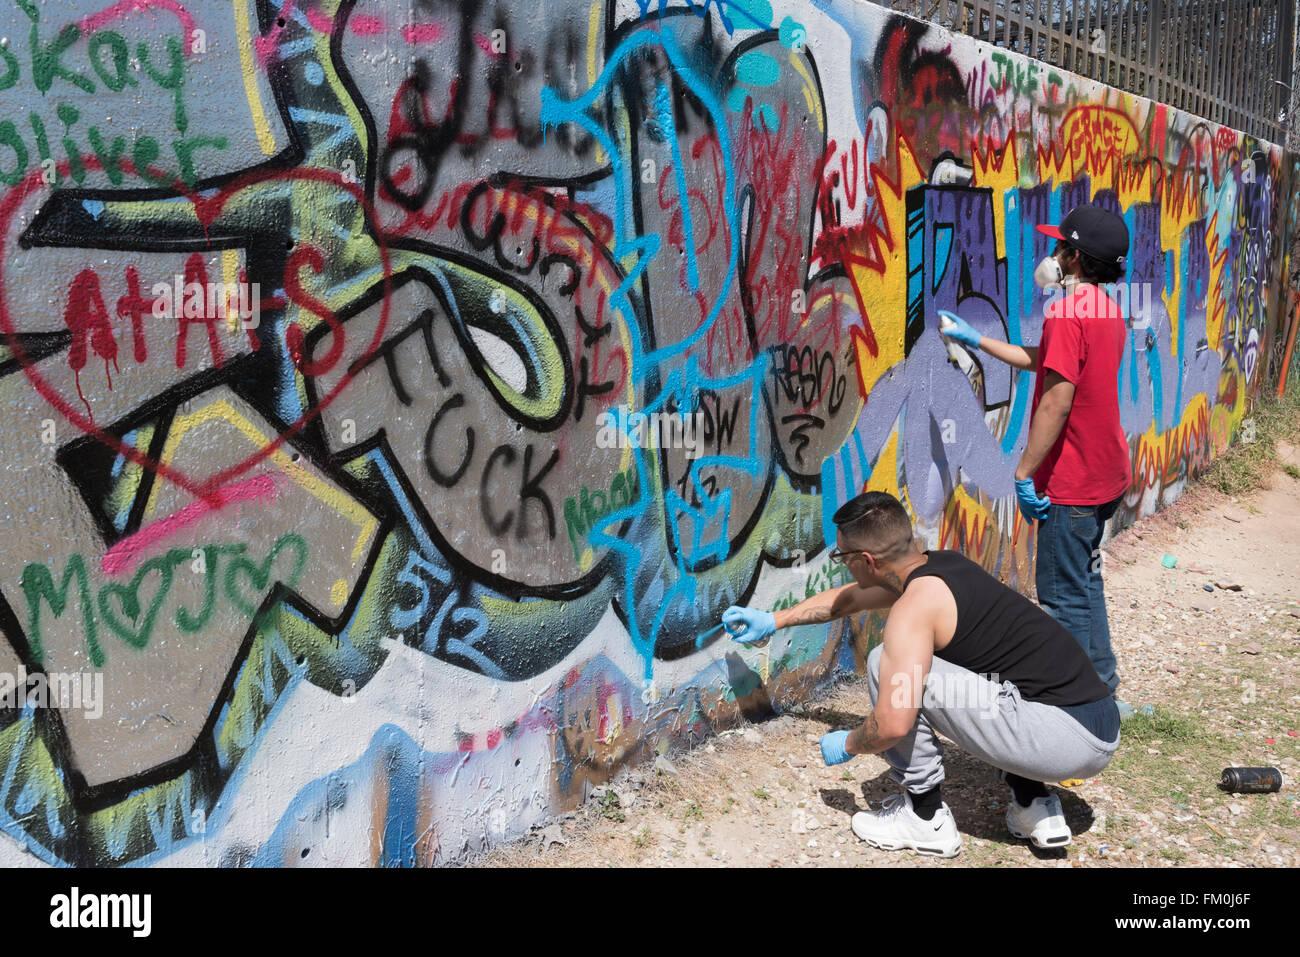 Graffiti wall austin - Stock Photo Two Graffiti Artists At Austin Graffiti Park Austin Texas Usa